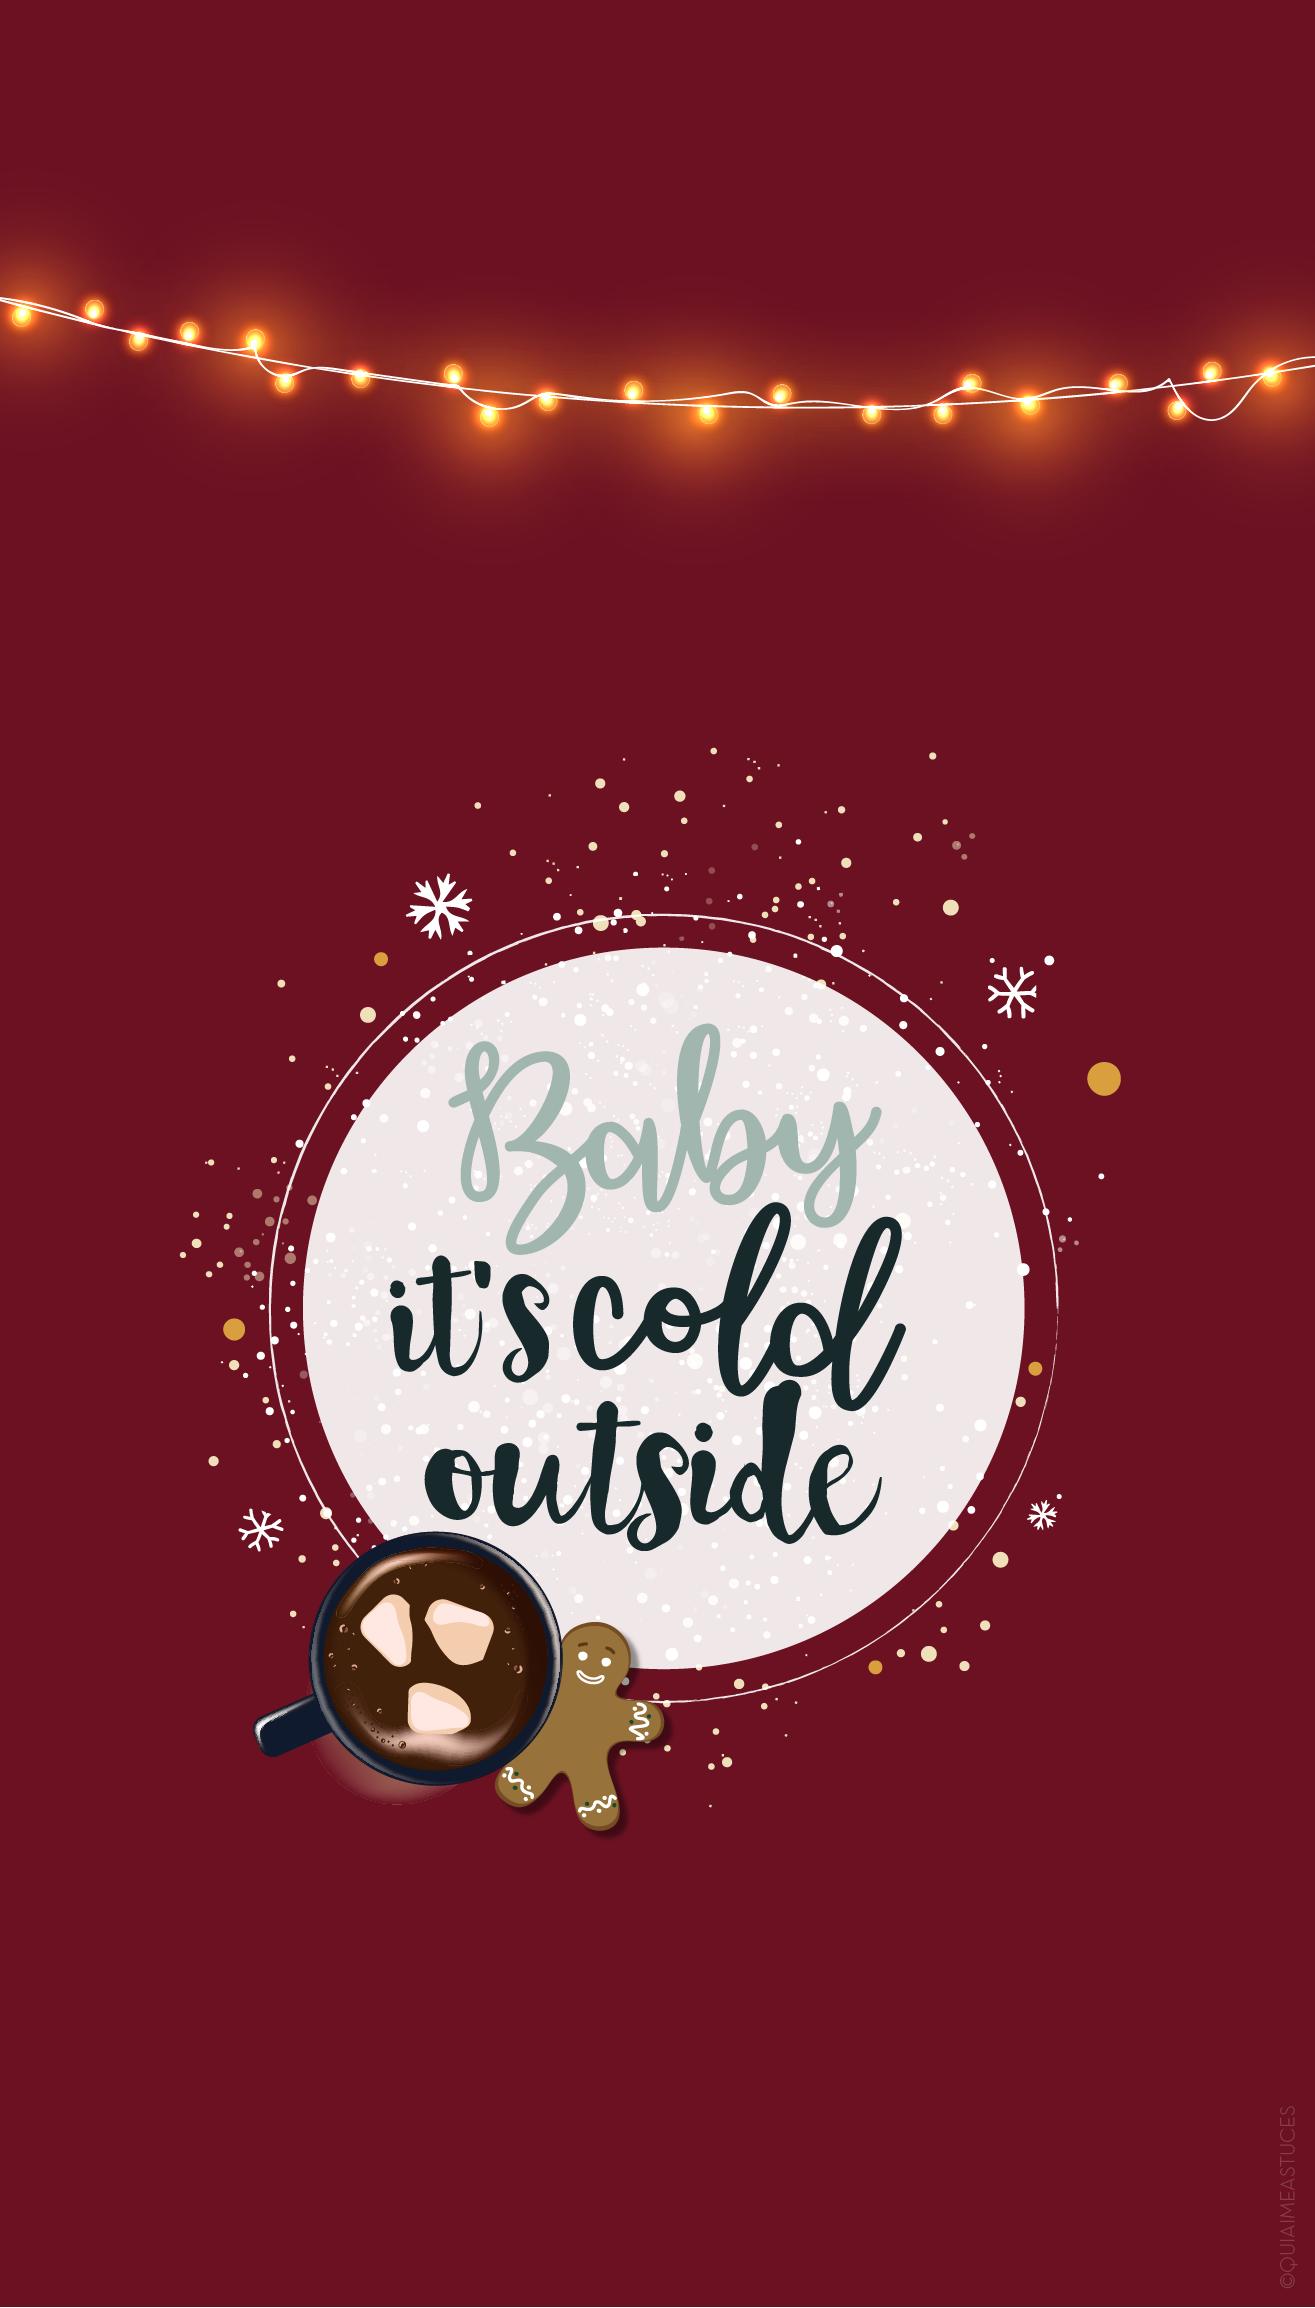 Fond D Ecran Noel Baby It S Cold Outside Cartes De Voeux Go Wallpapers In 2020 Christmas Screen Savers Wallpaper Iphone Christmas Christmas Phone Wallpaper